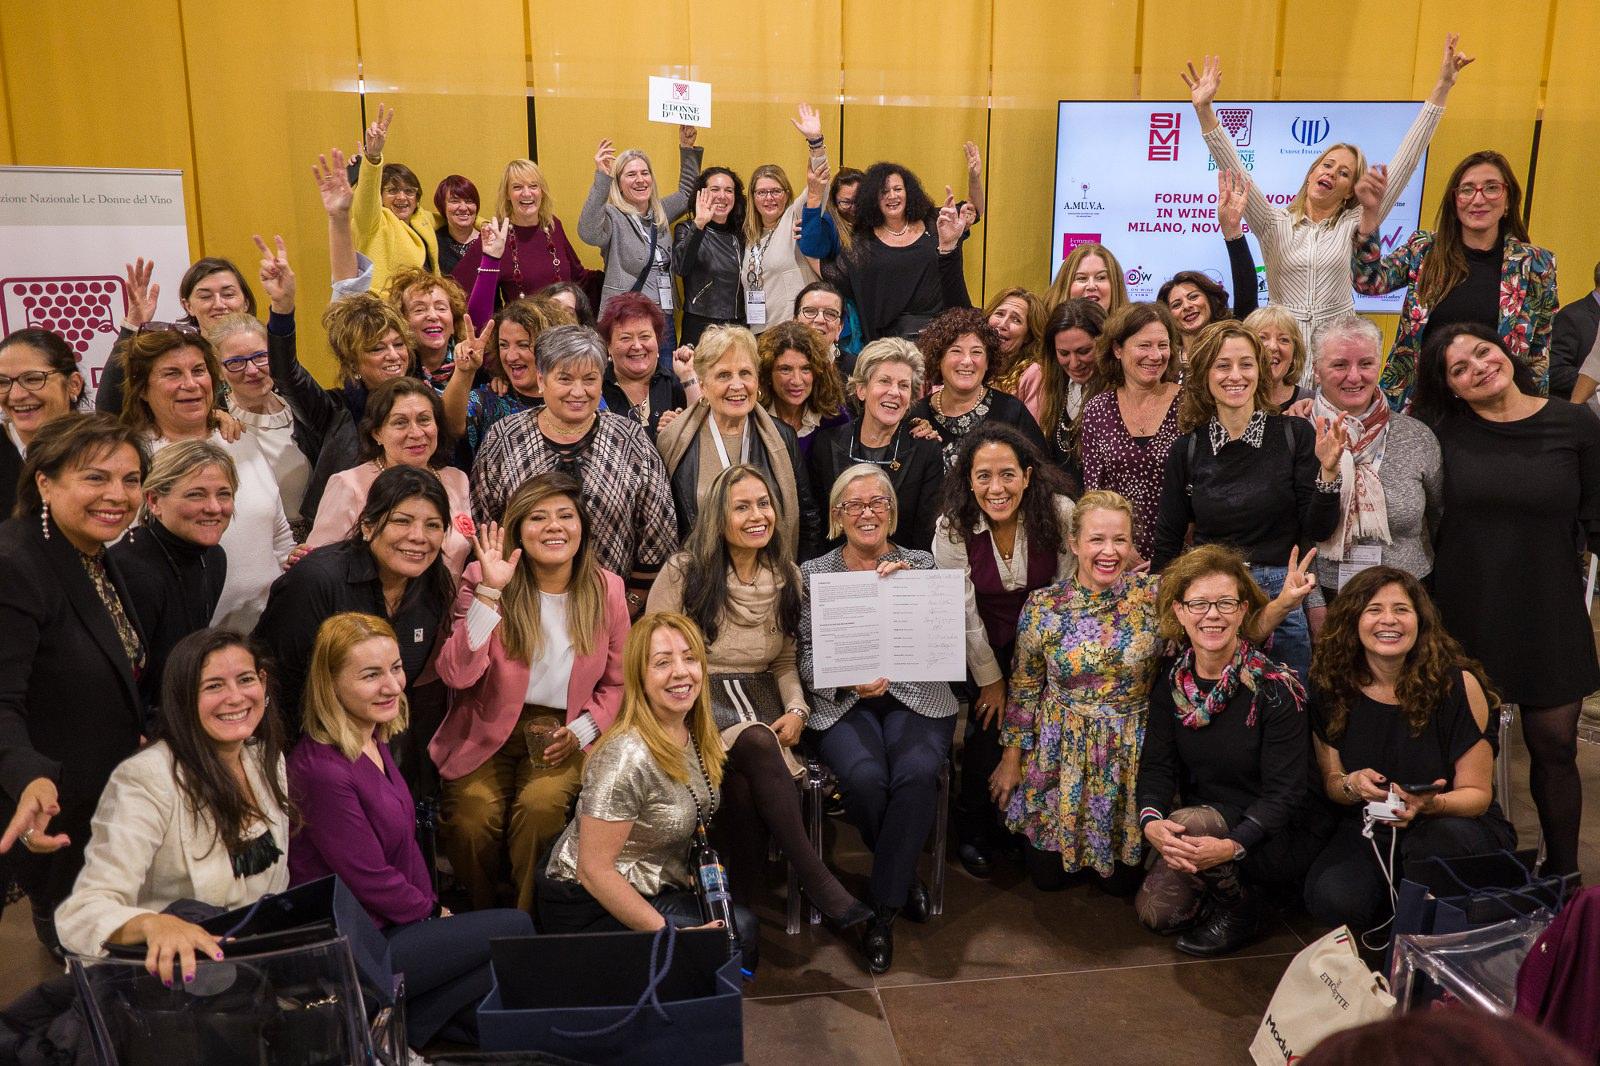 FORUM OF THE WOMEN IN WINE WORLDWIDE, SIMEI  – Milano, 20 novembre 2019